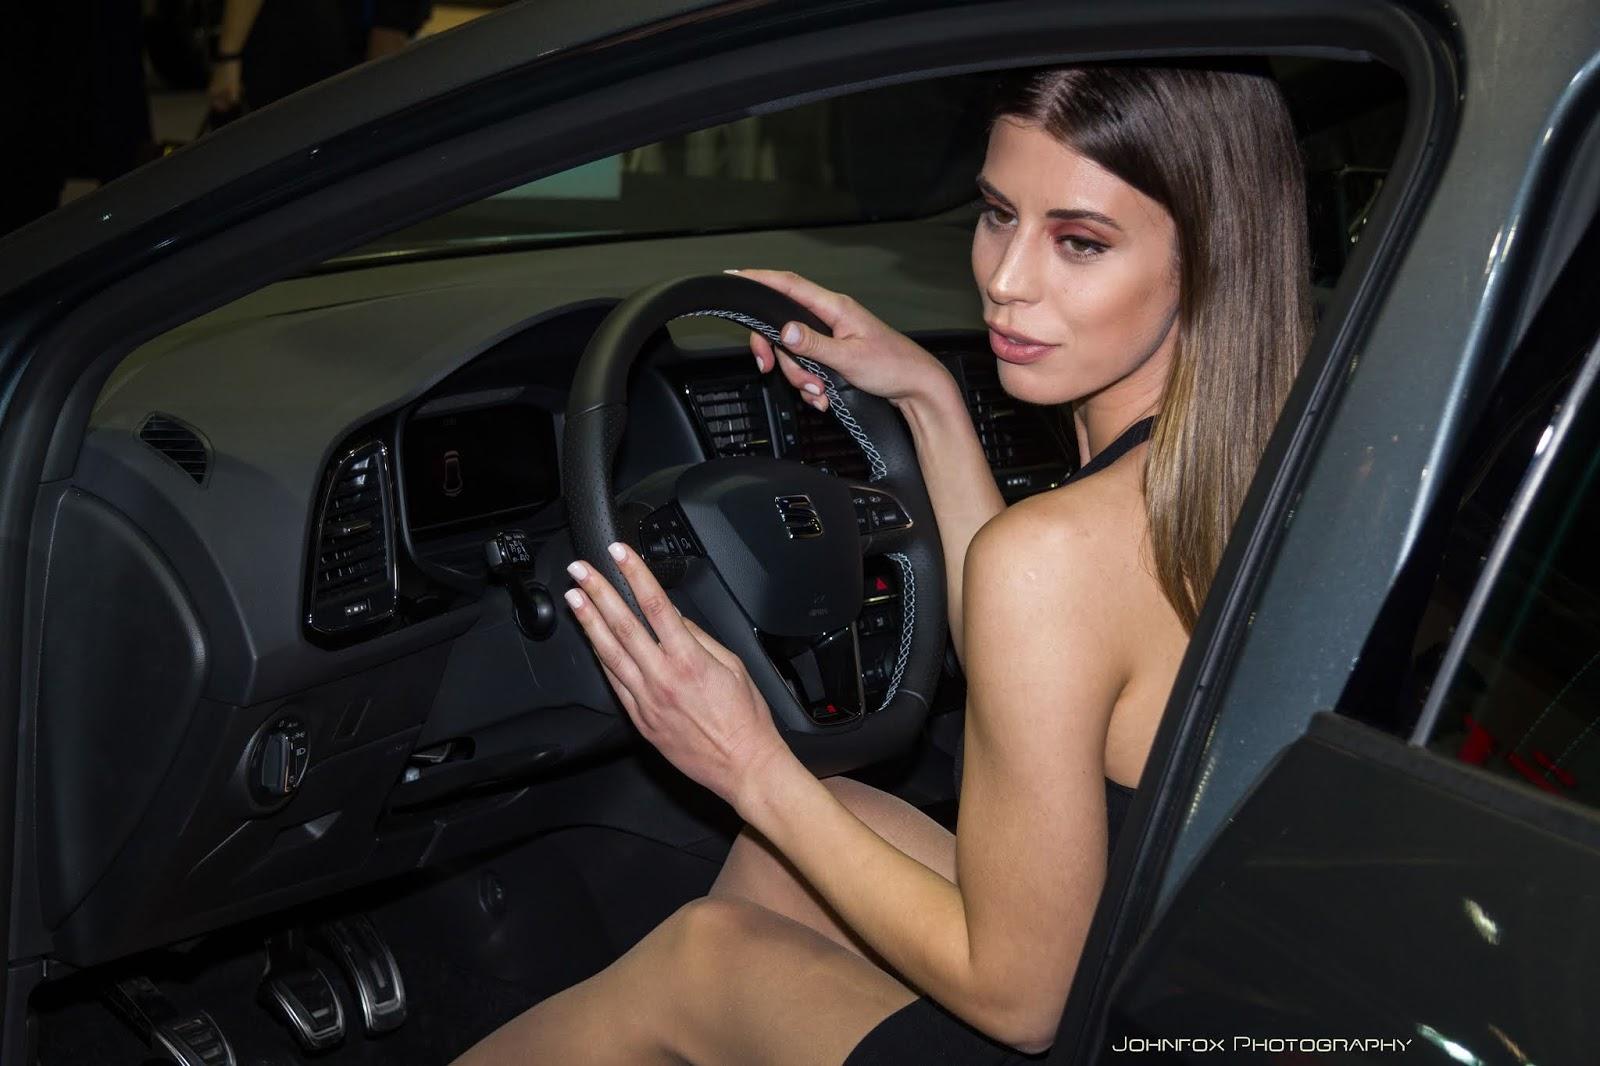 models2B2528212Bof2B232529 Τα κορίτσια της Αυτοκίνησης! Έκθεση, μοντέλα, ΦΩΤΟ, φωτογραφίες